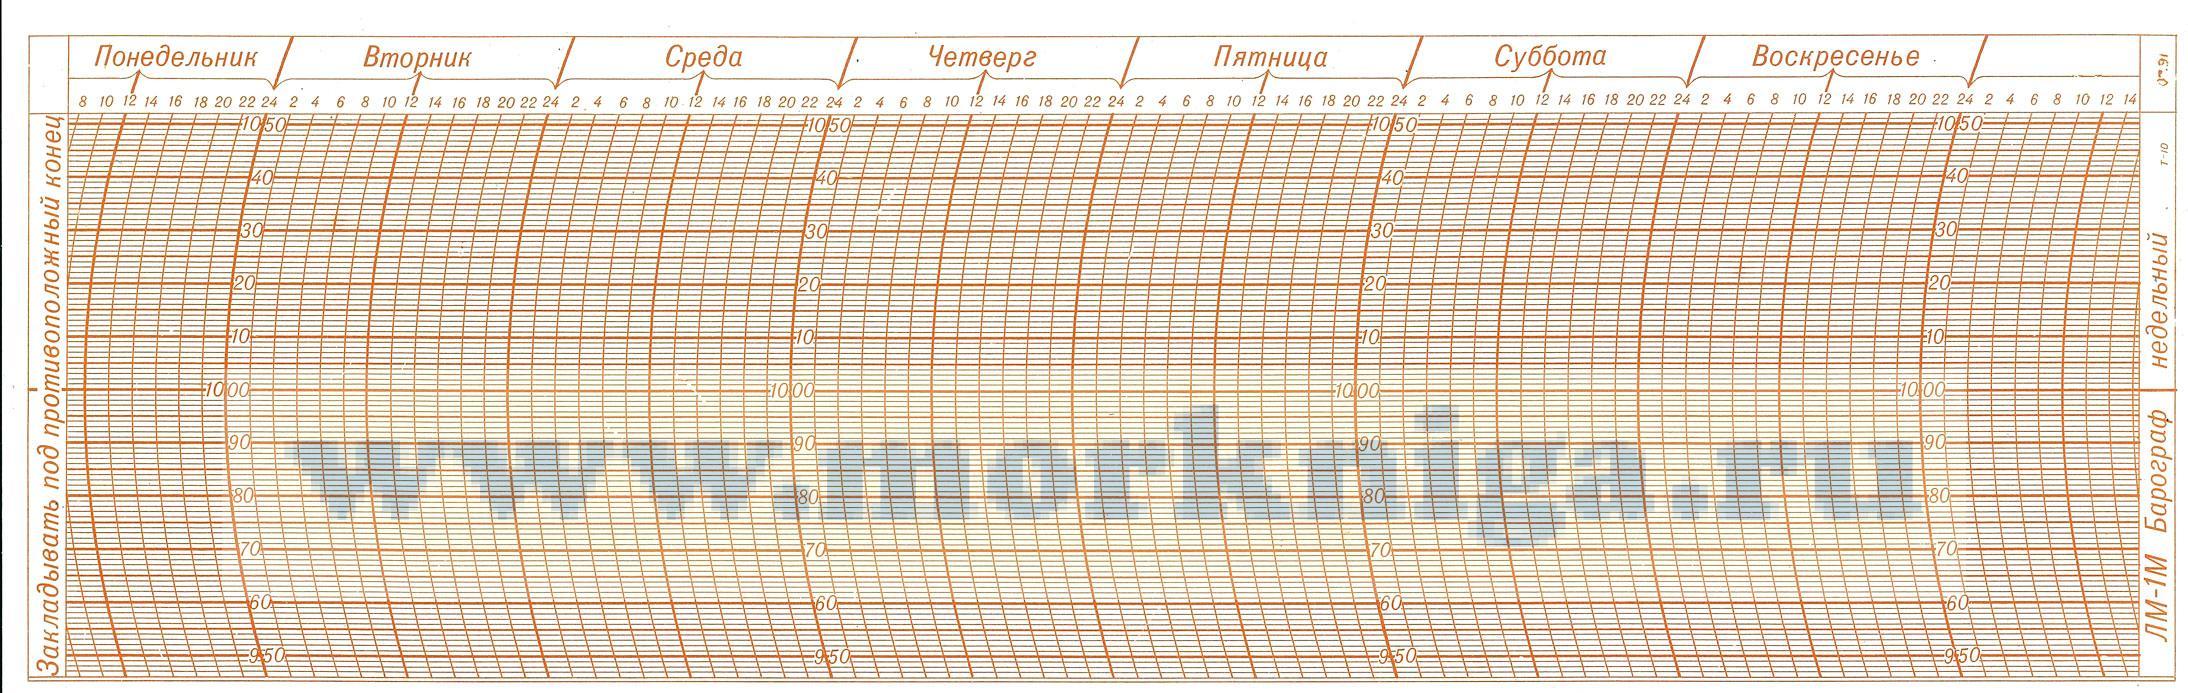 Бланк (лента) для барографа М-22А